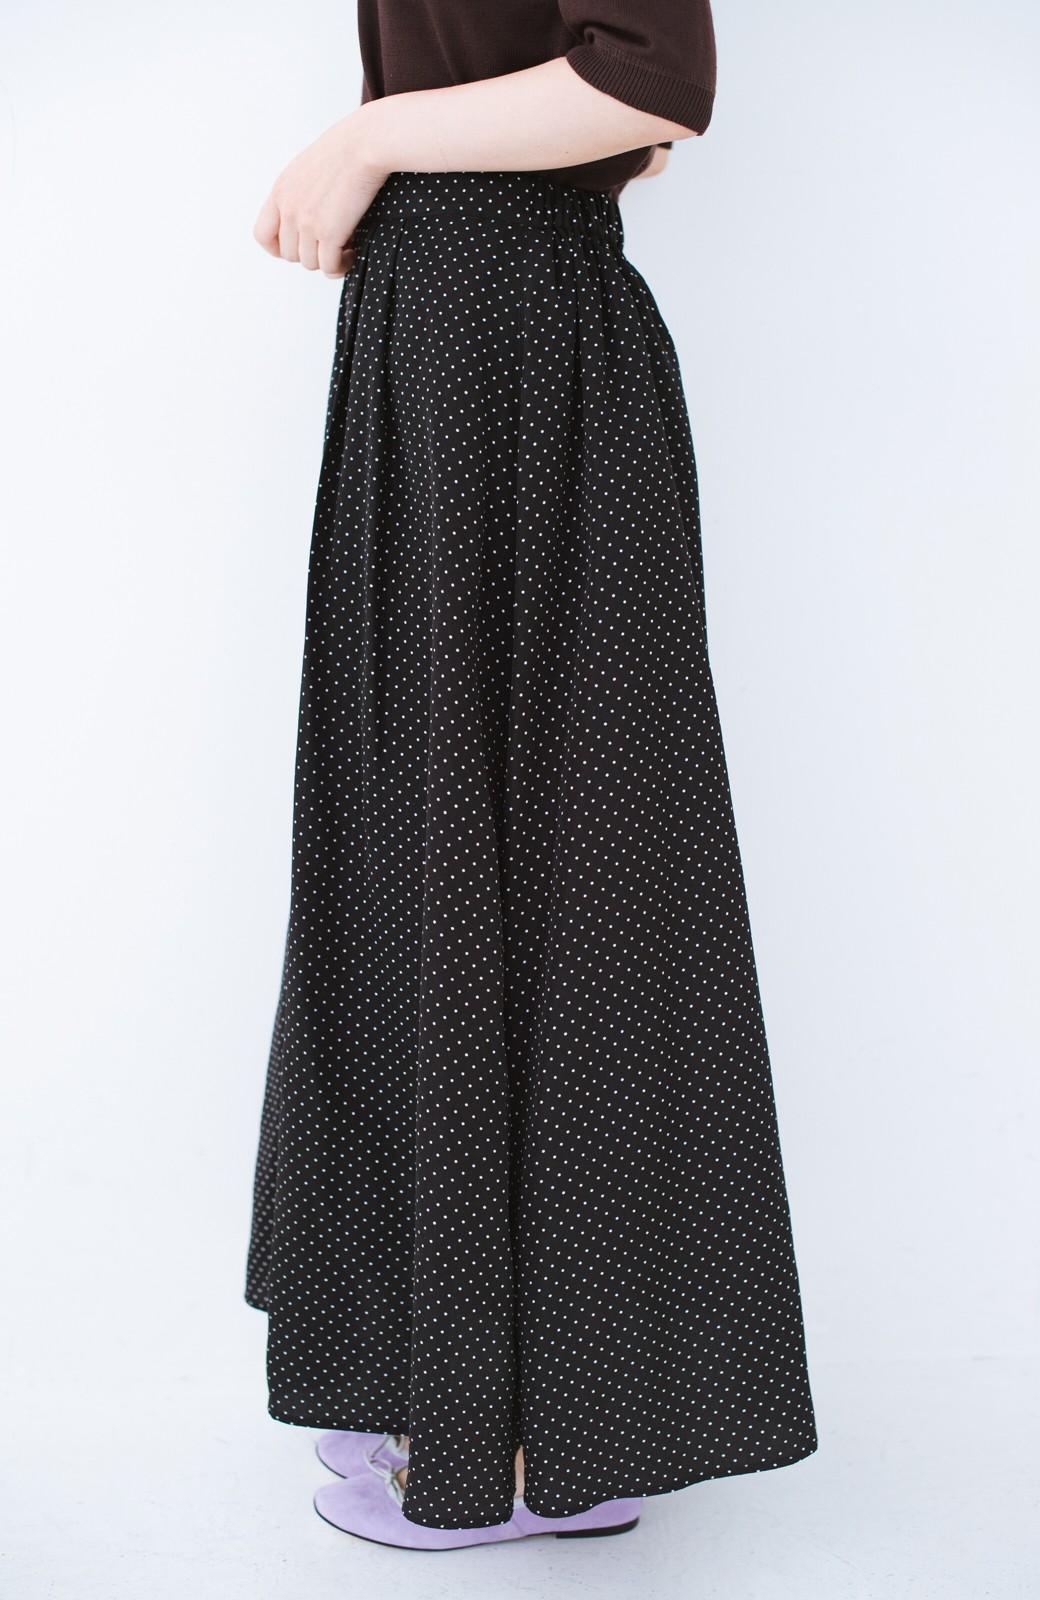 haco! ずっと着られる大人のドットロングスカート by que made me <ブラック系その他>の商品写真2